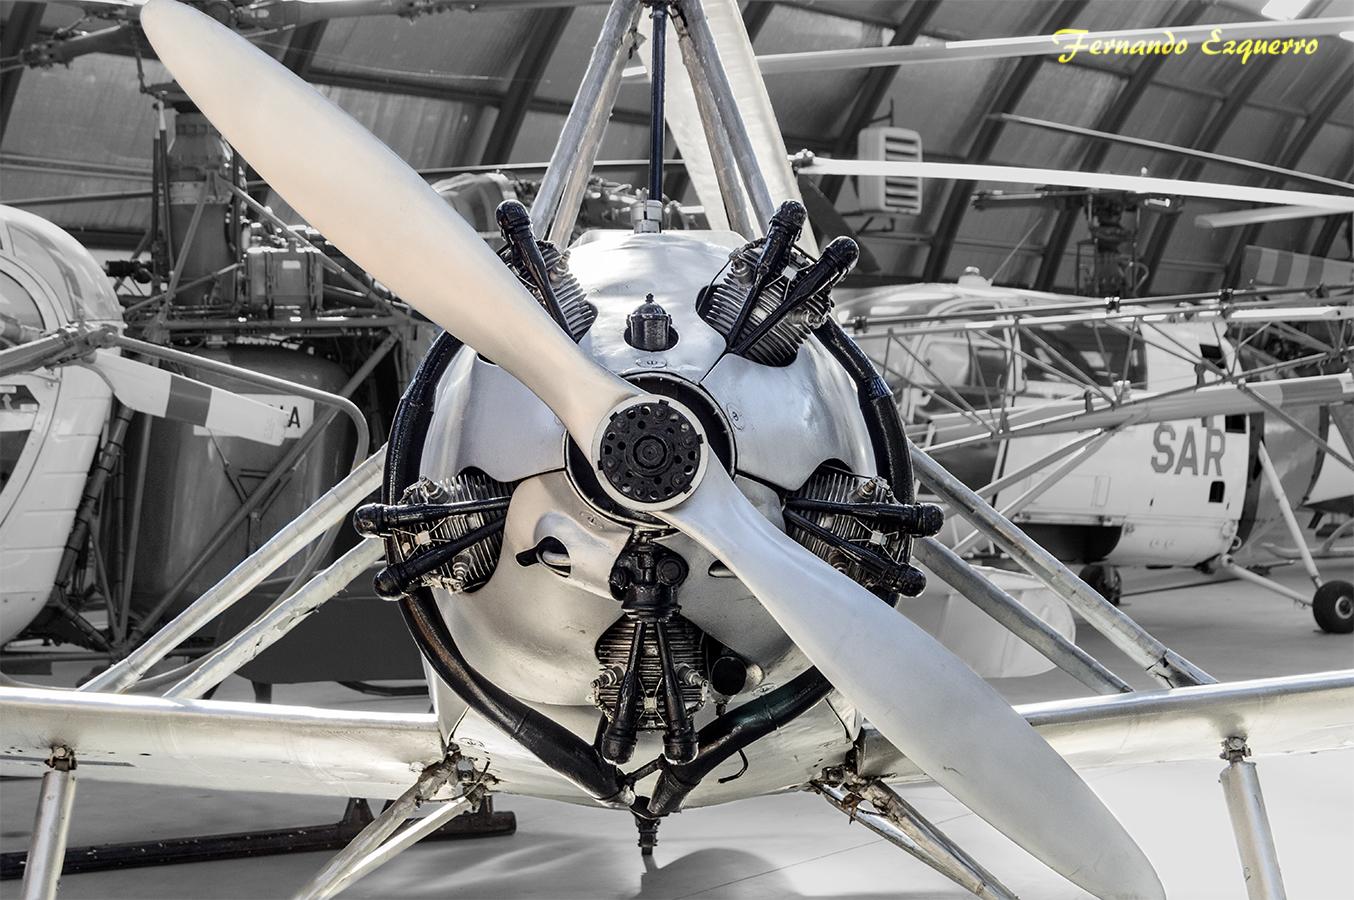 Autogiro La Cierva C-30